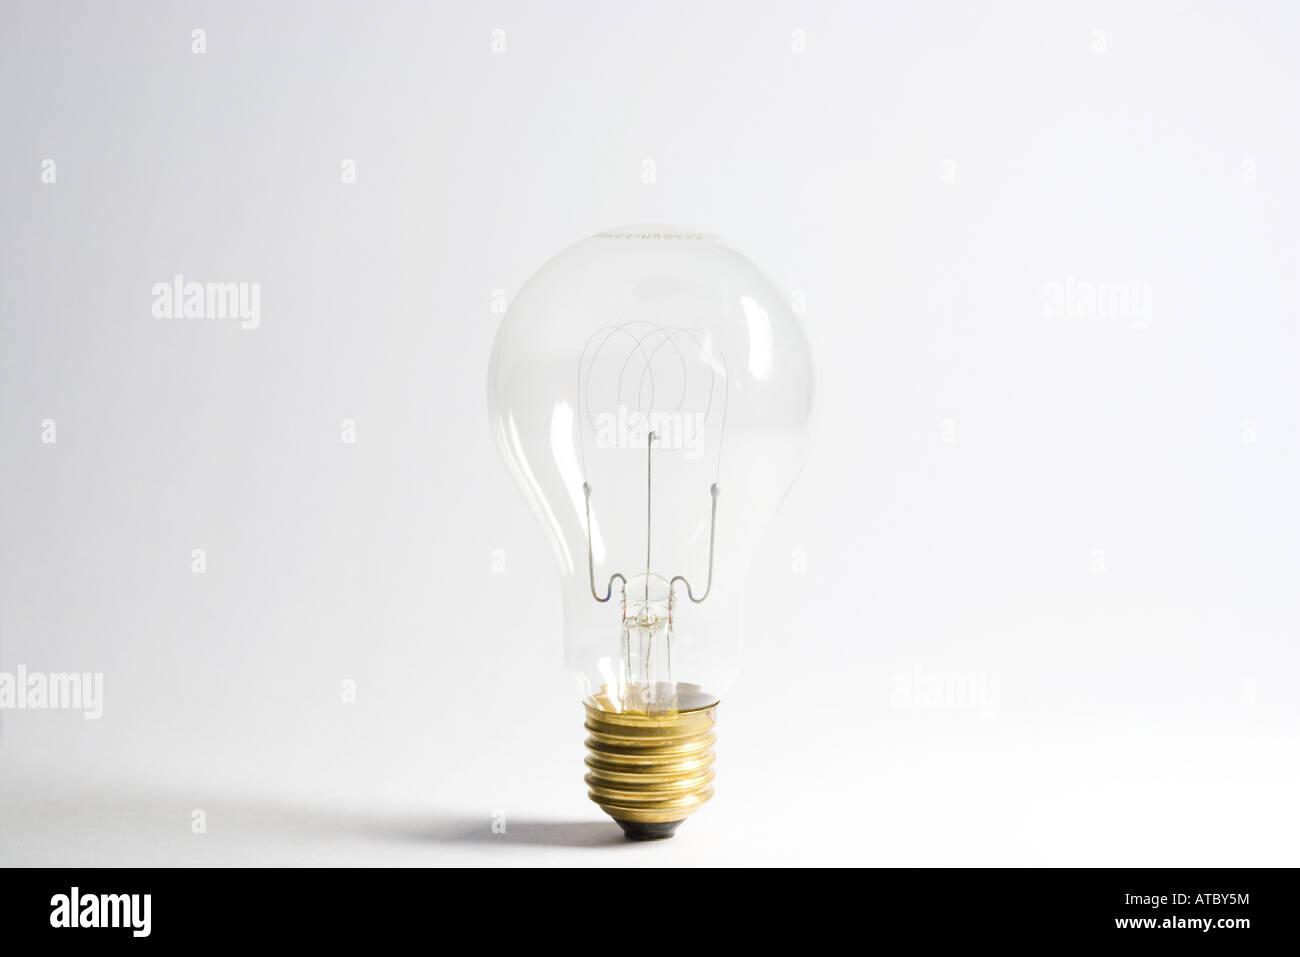 Light bulb, close-up - Stock Image